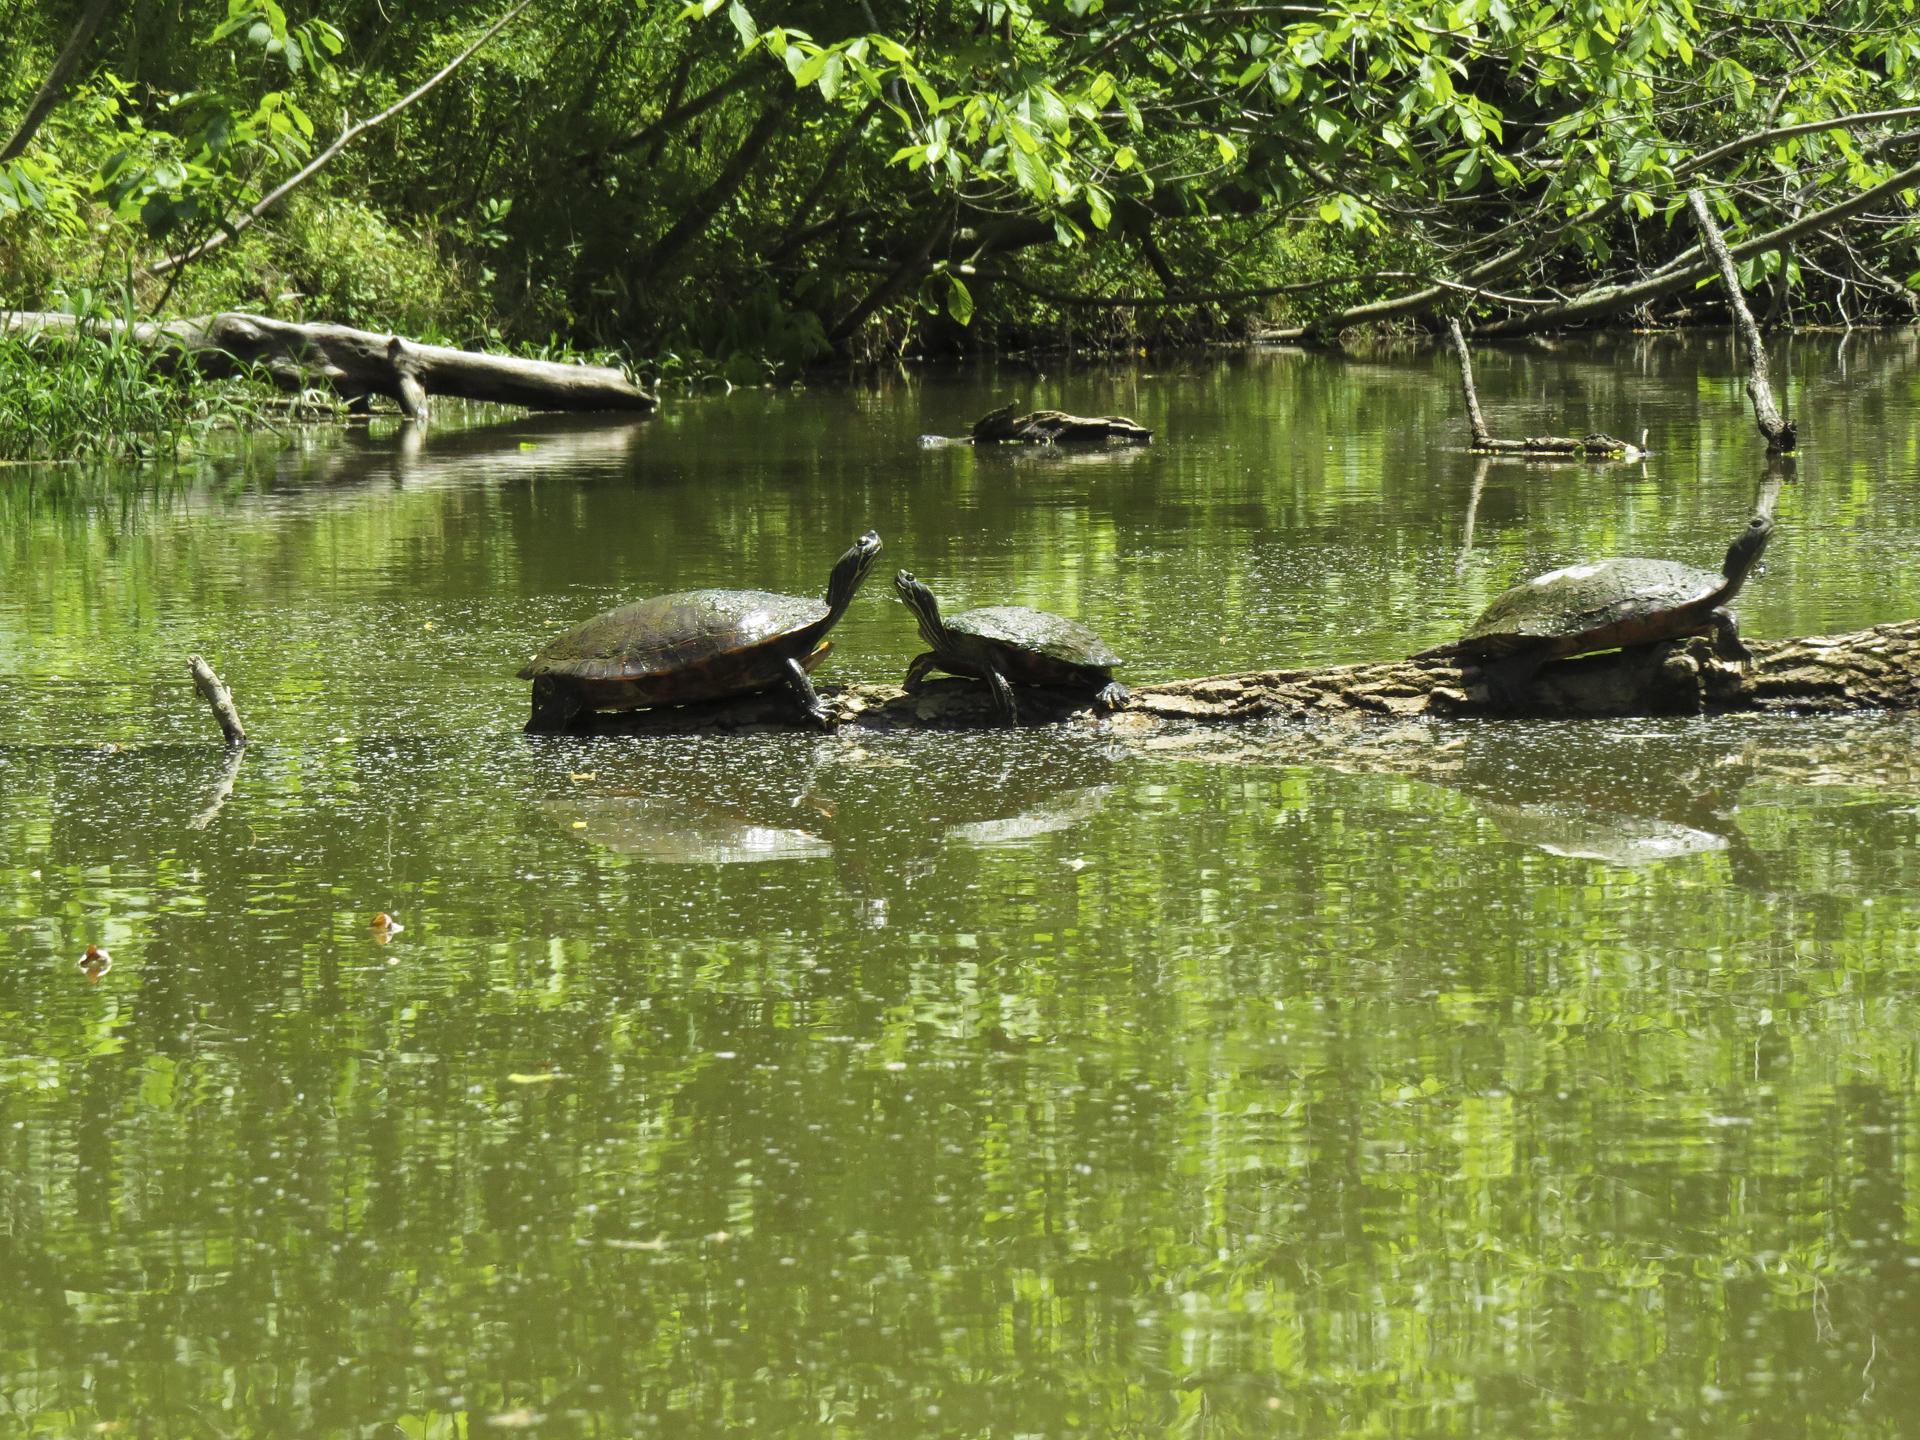 turtles-kayaking-maryland-water-nature-outdoors-c&o-canal-potomac-river